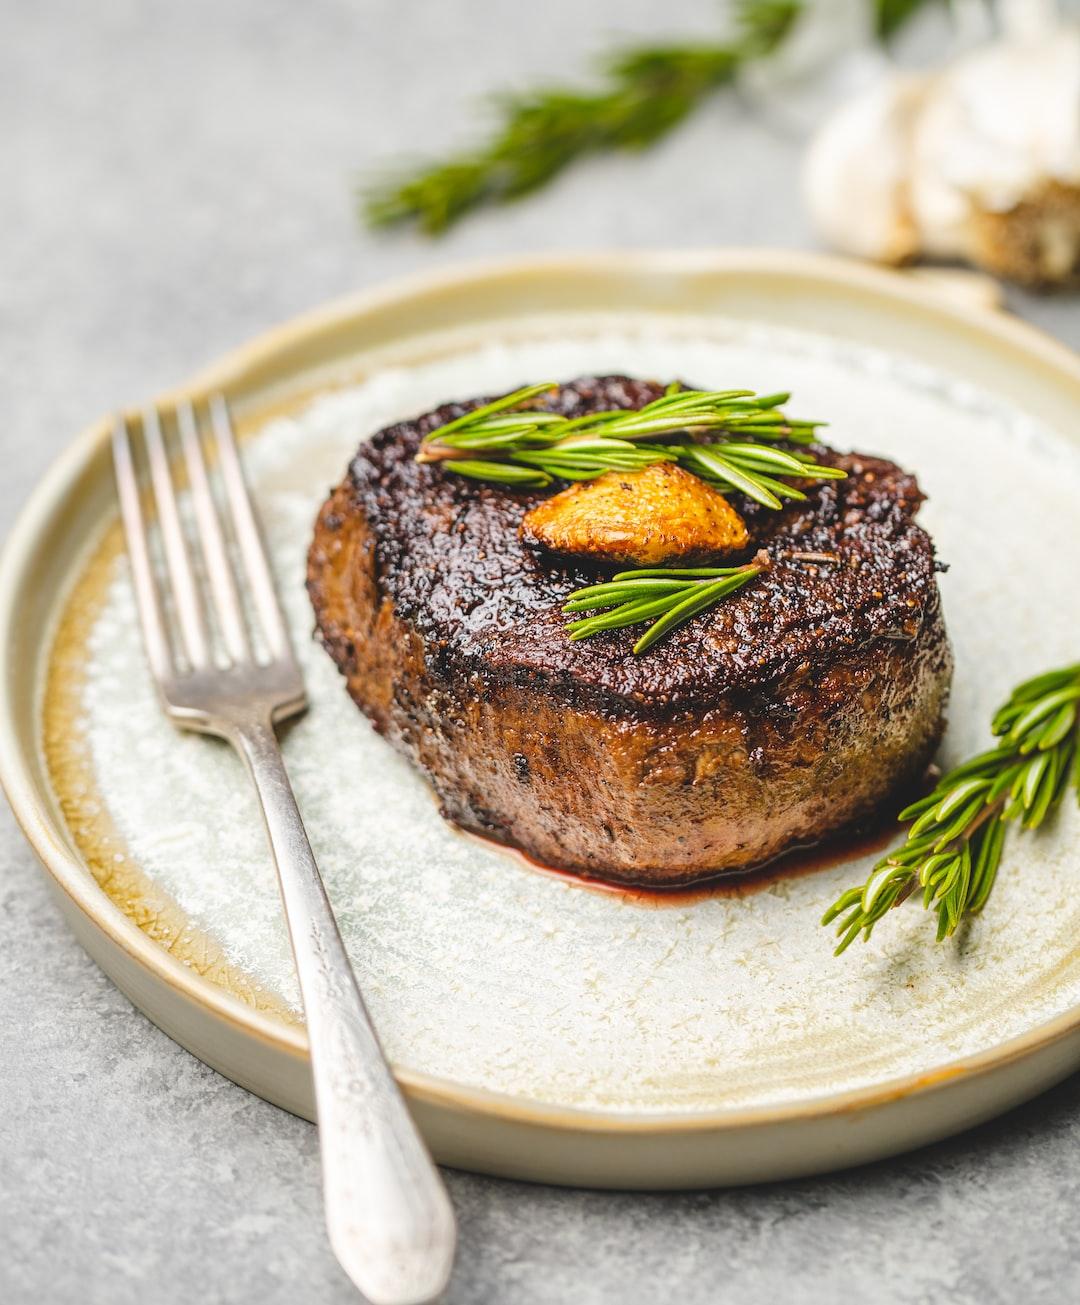 Filet Mignon. The King of steaks.